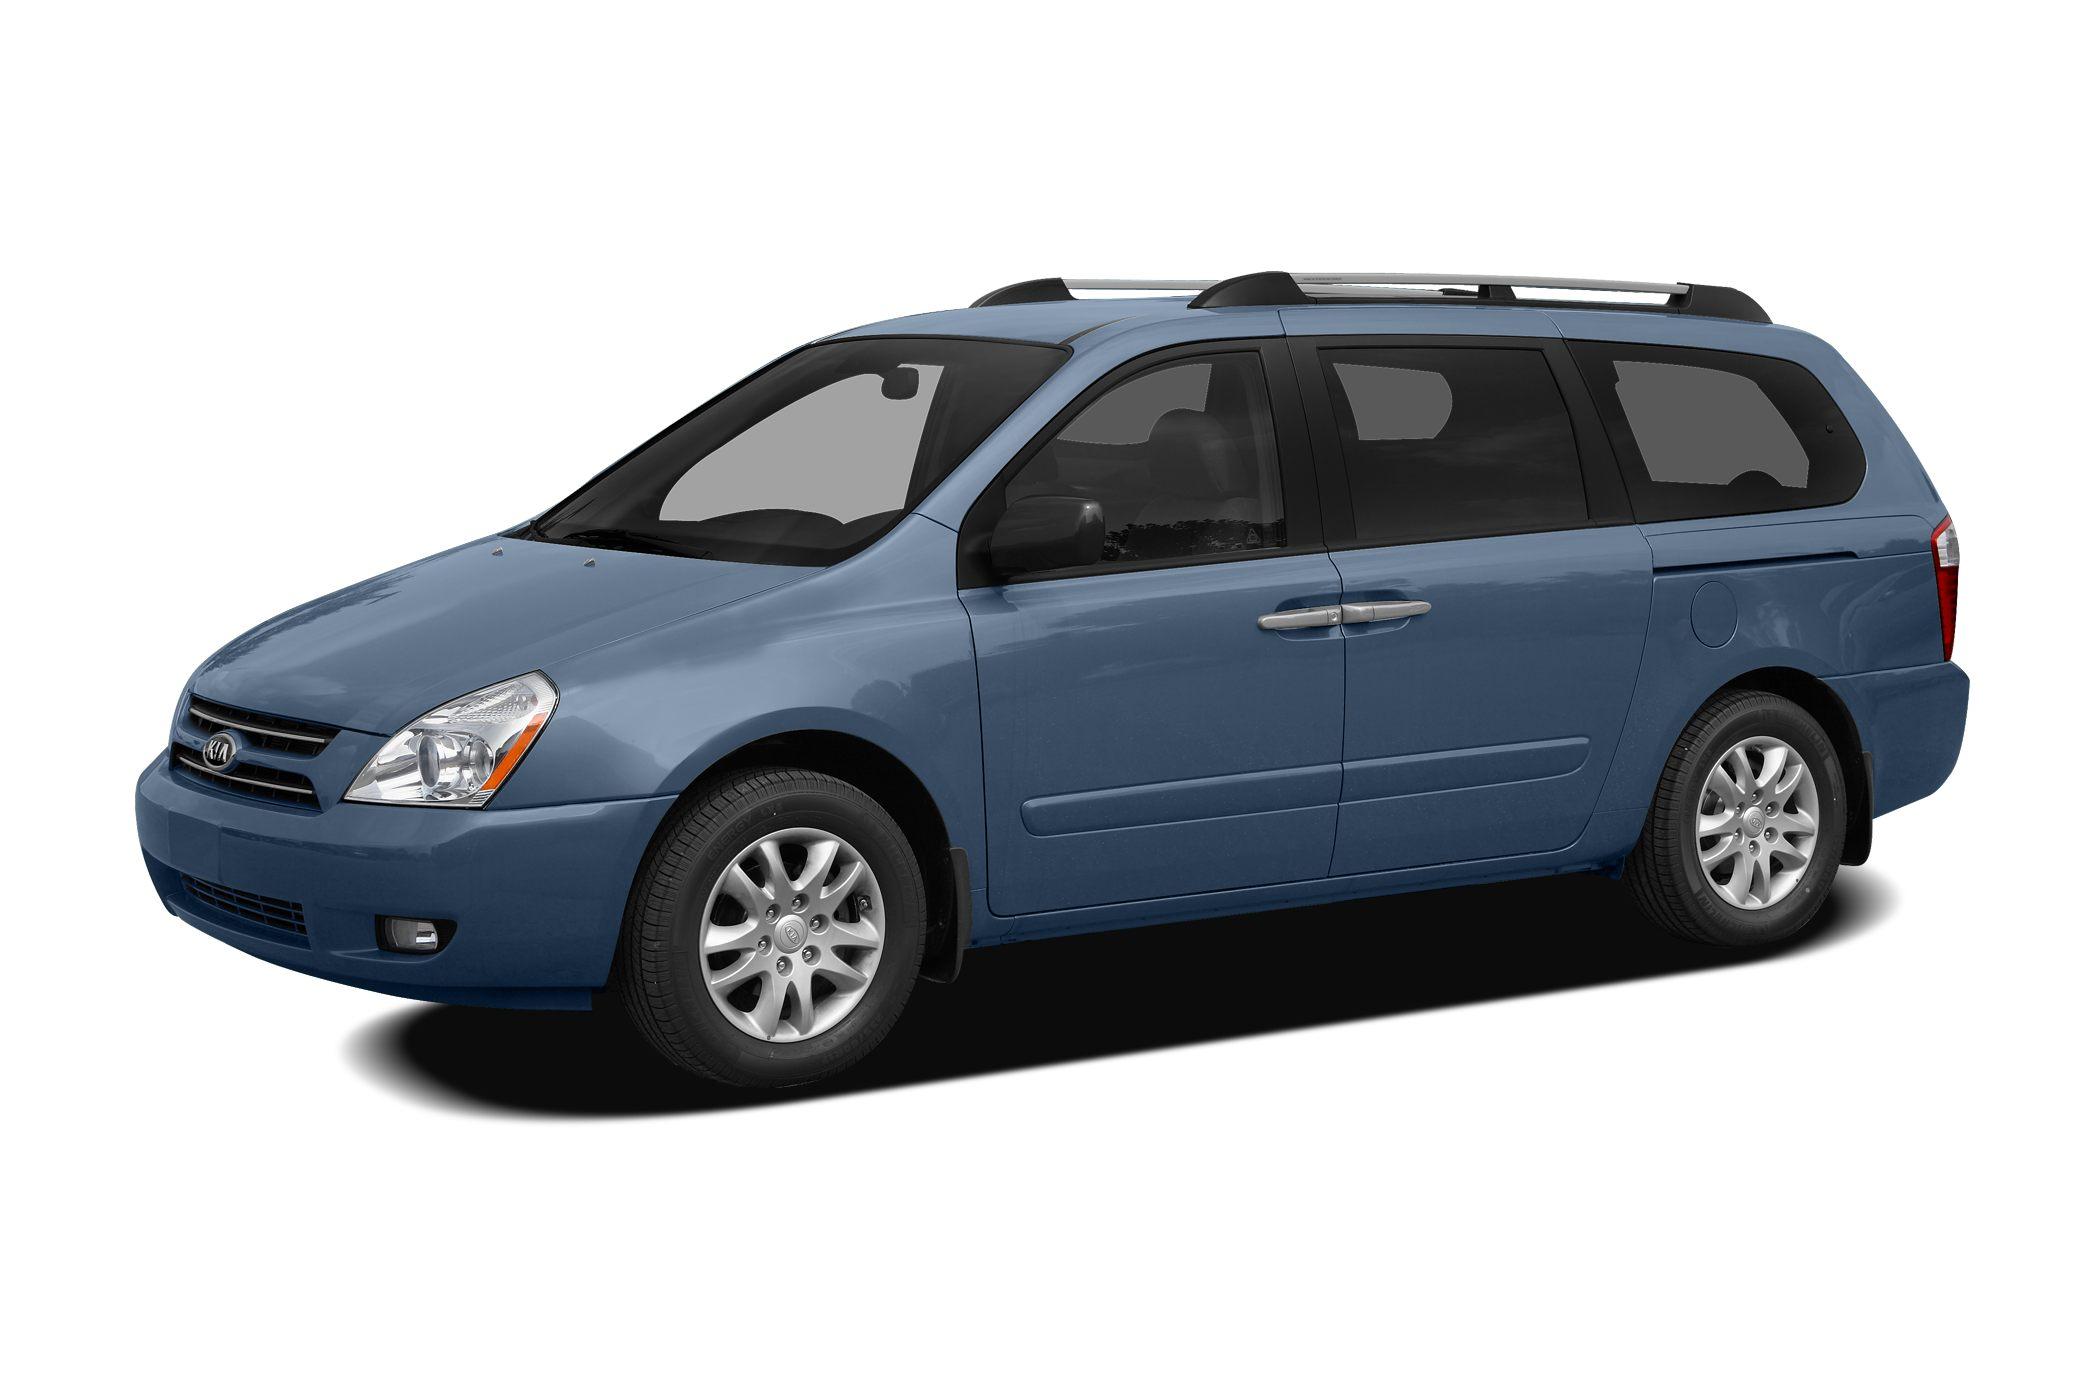 2007 Kia Sedona Specs And Prices 2005 Lexus Rx330 Blue